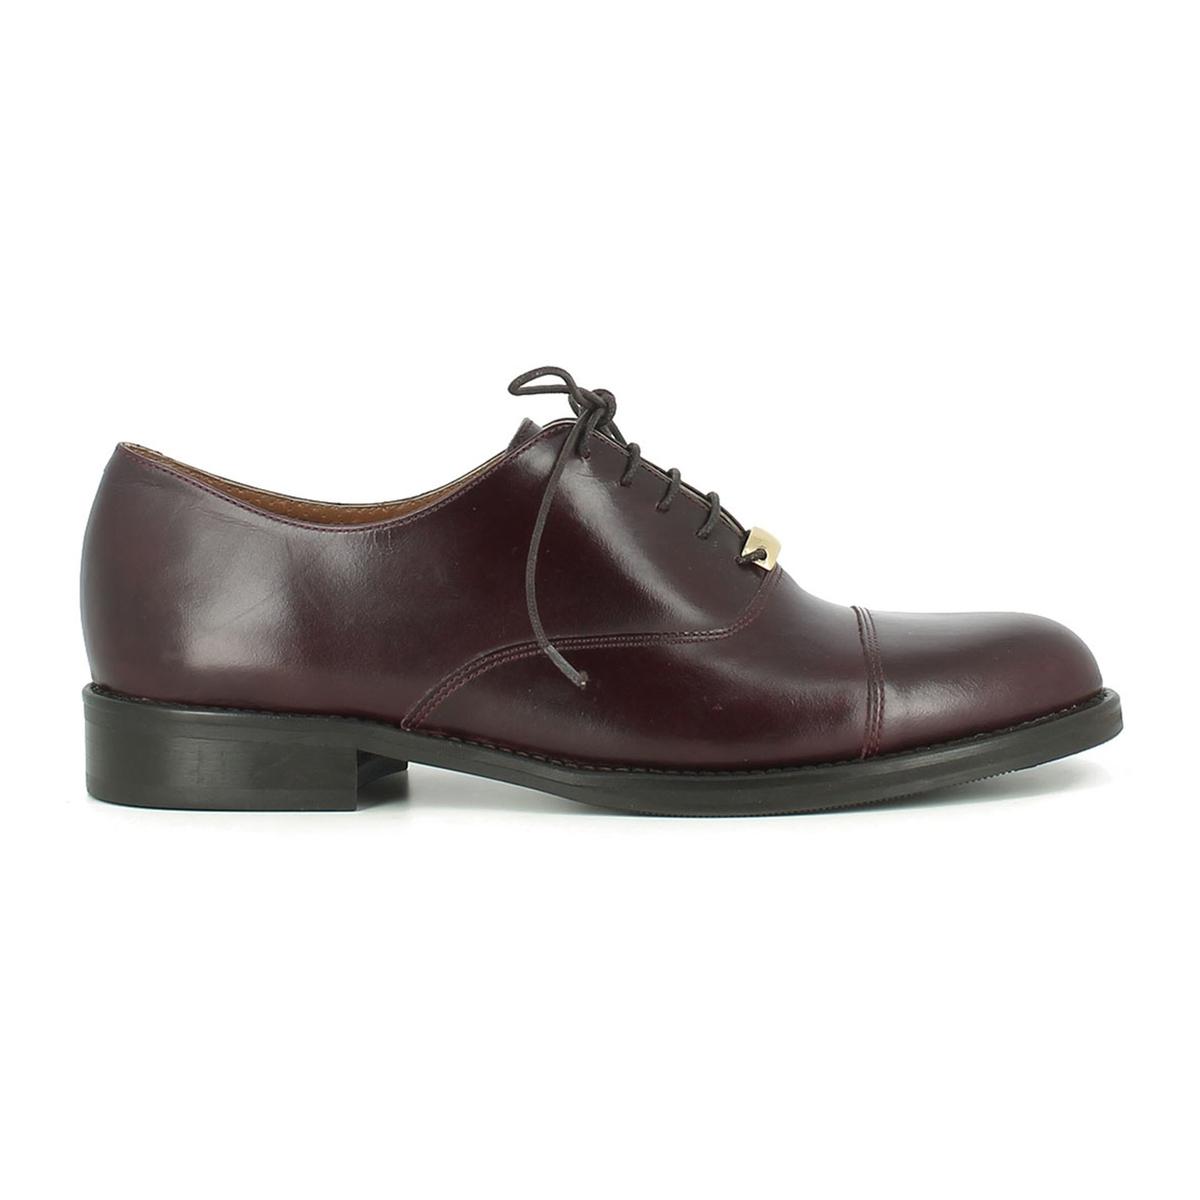 Ботинки-дерби из кожи Deegan ботинки дерби из мягкой кожи takarika